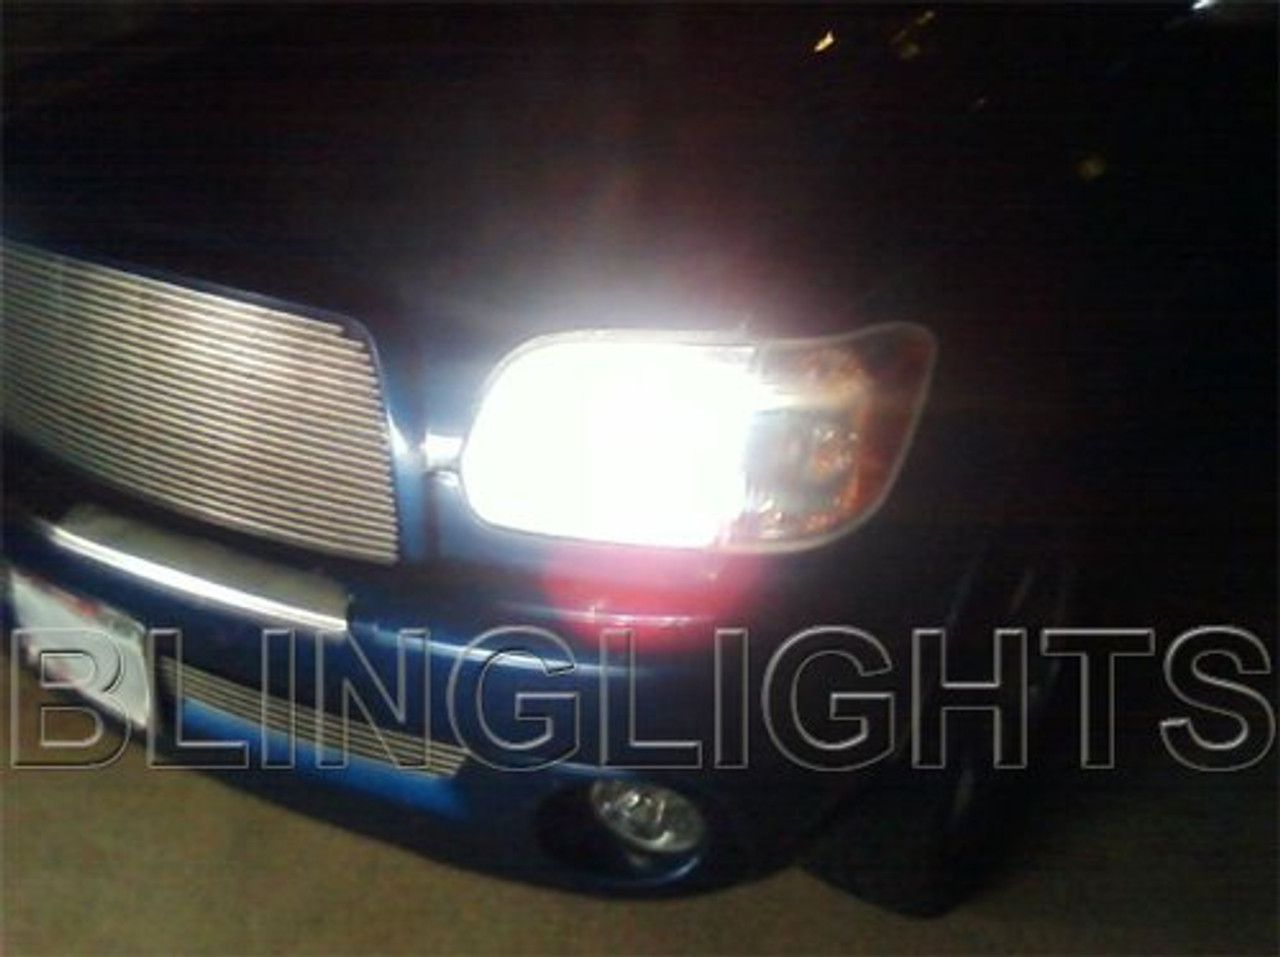 2003 2004 2005 2006 Toyota Tundra Bright White Light Bulbs for Headlamps Headlights Head Lamps